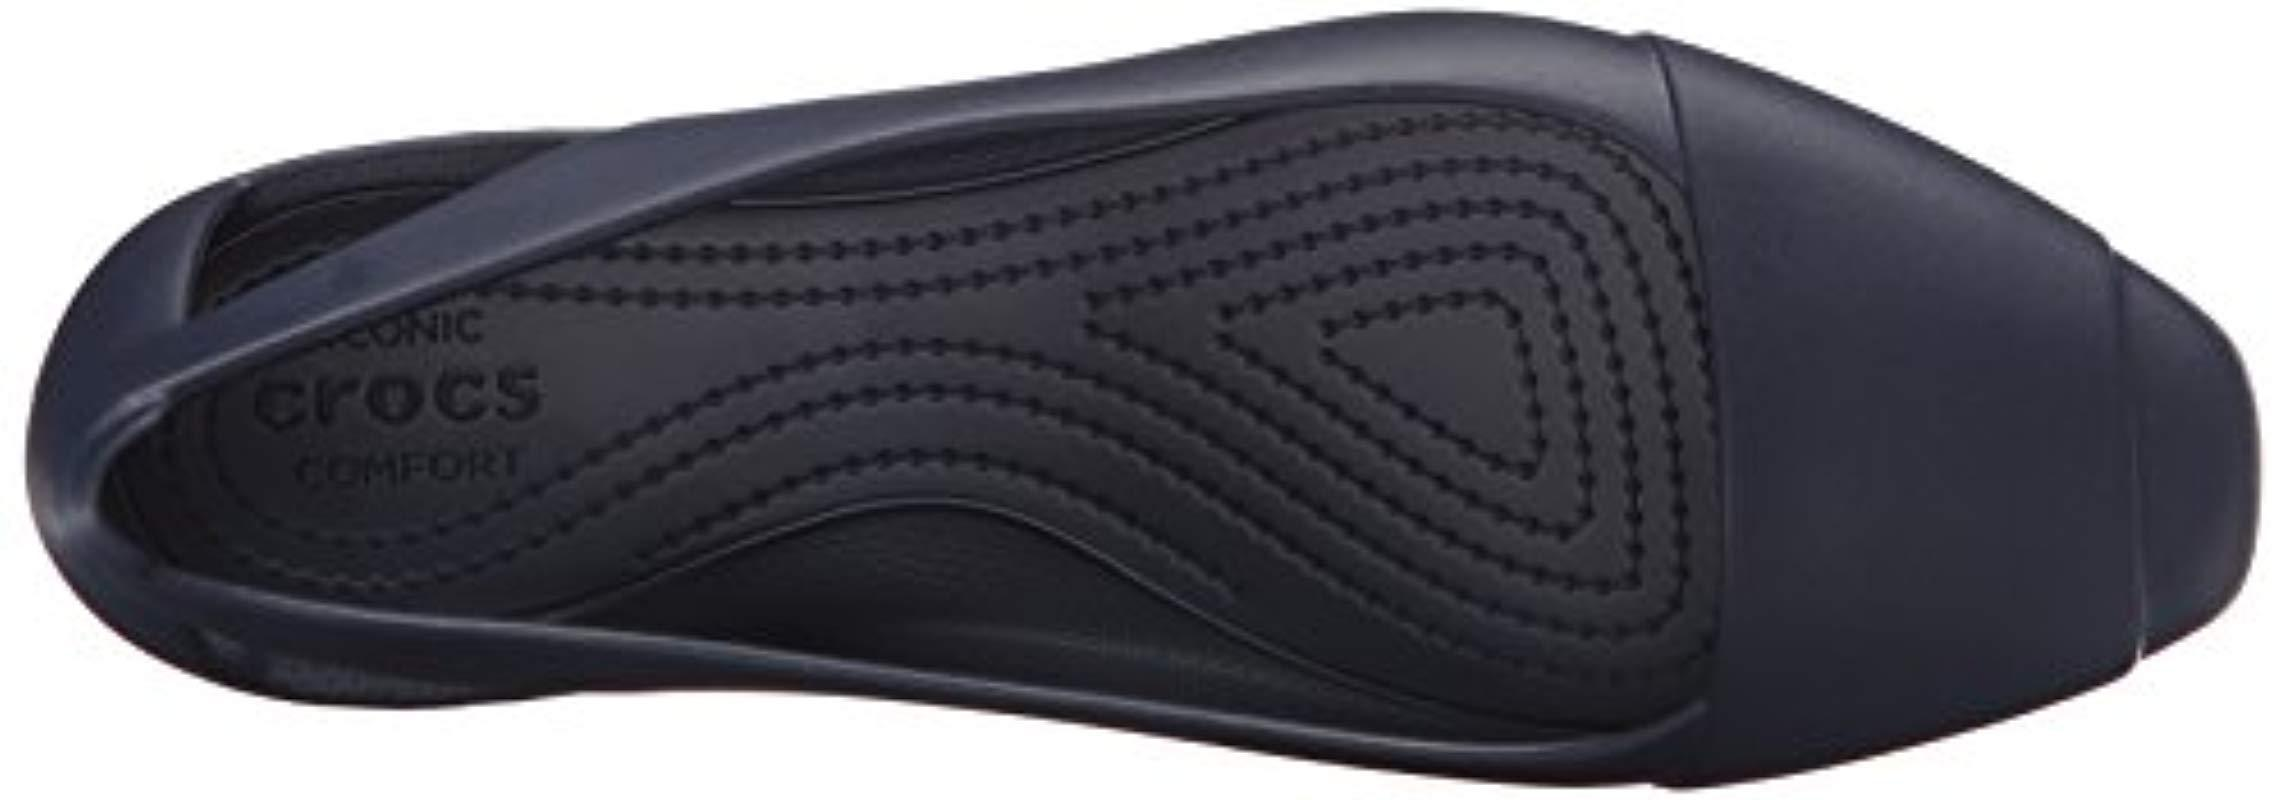 Sienna Flat Crocs�?de color Azul